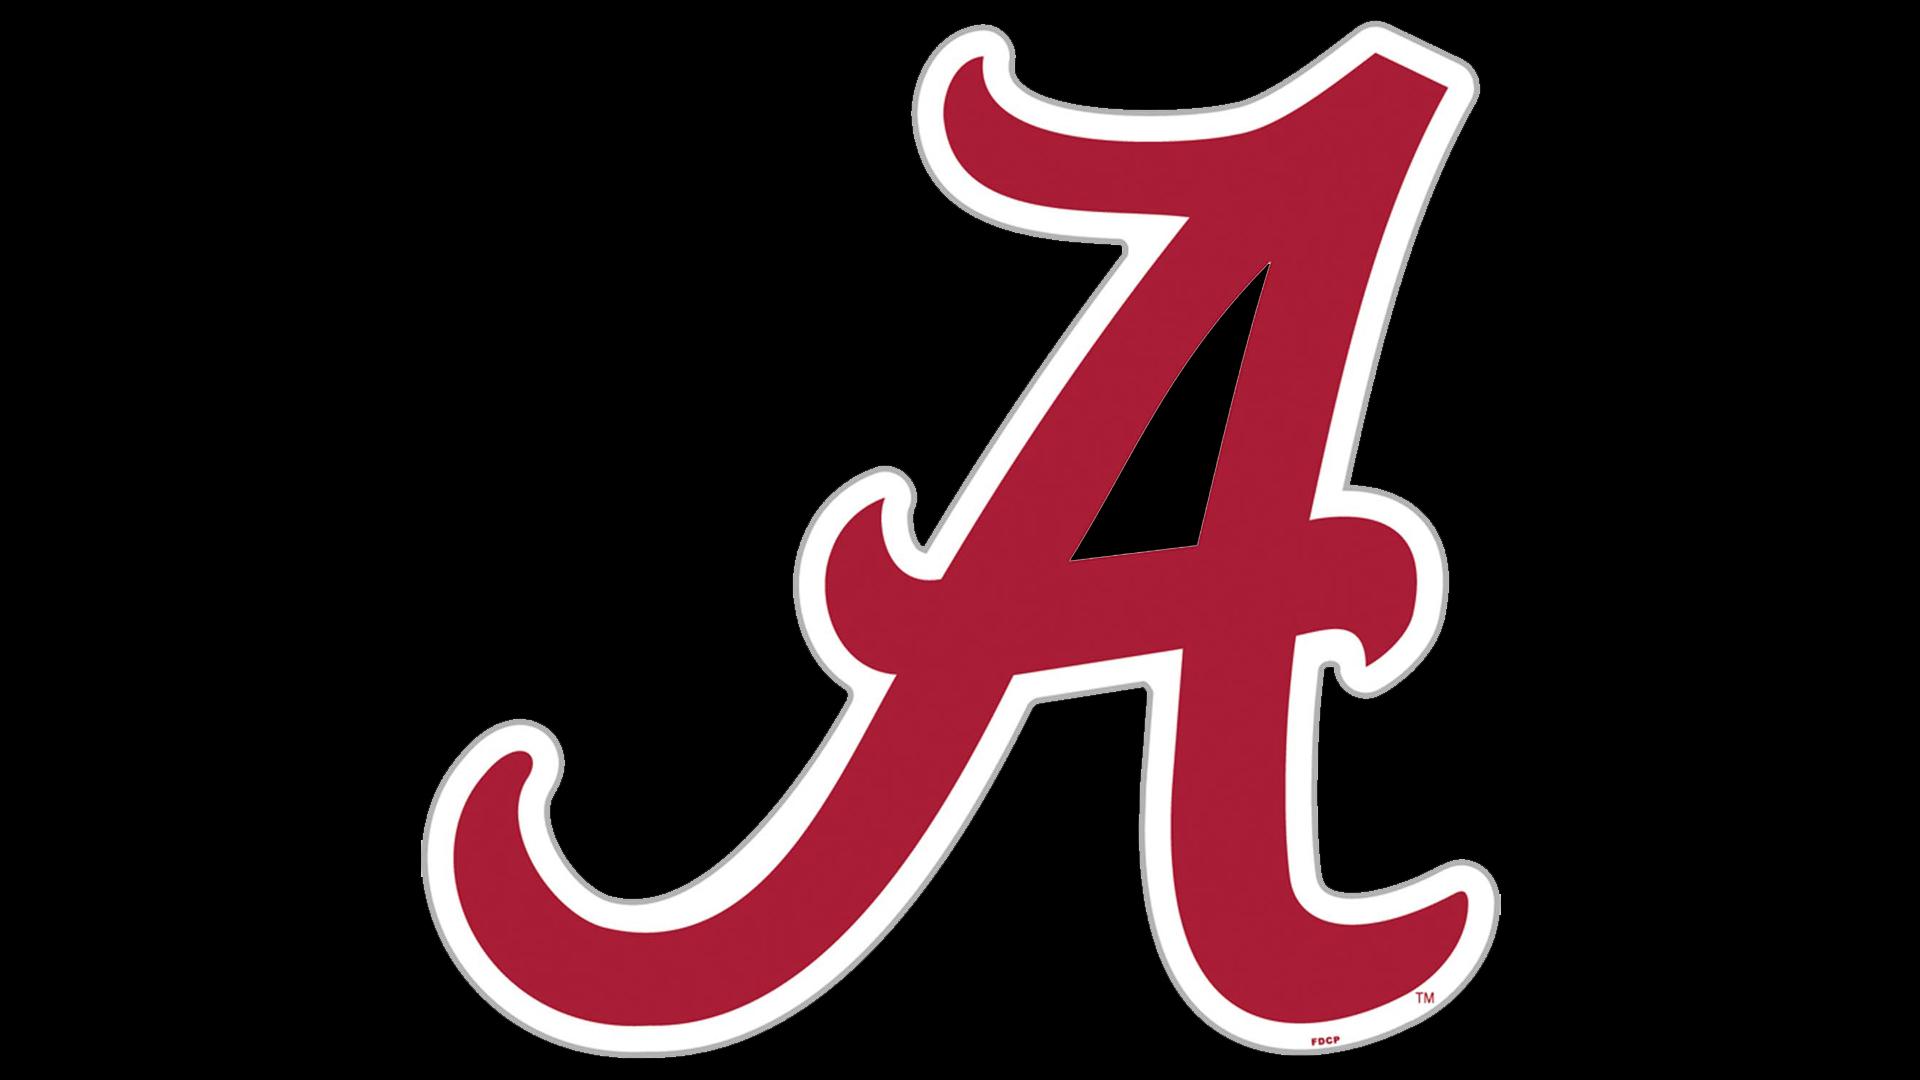 Meaning Alabama Crimson Tide logo and symbol.